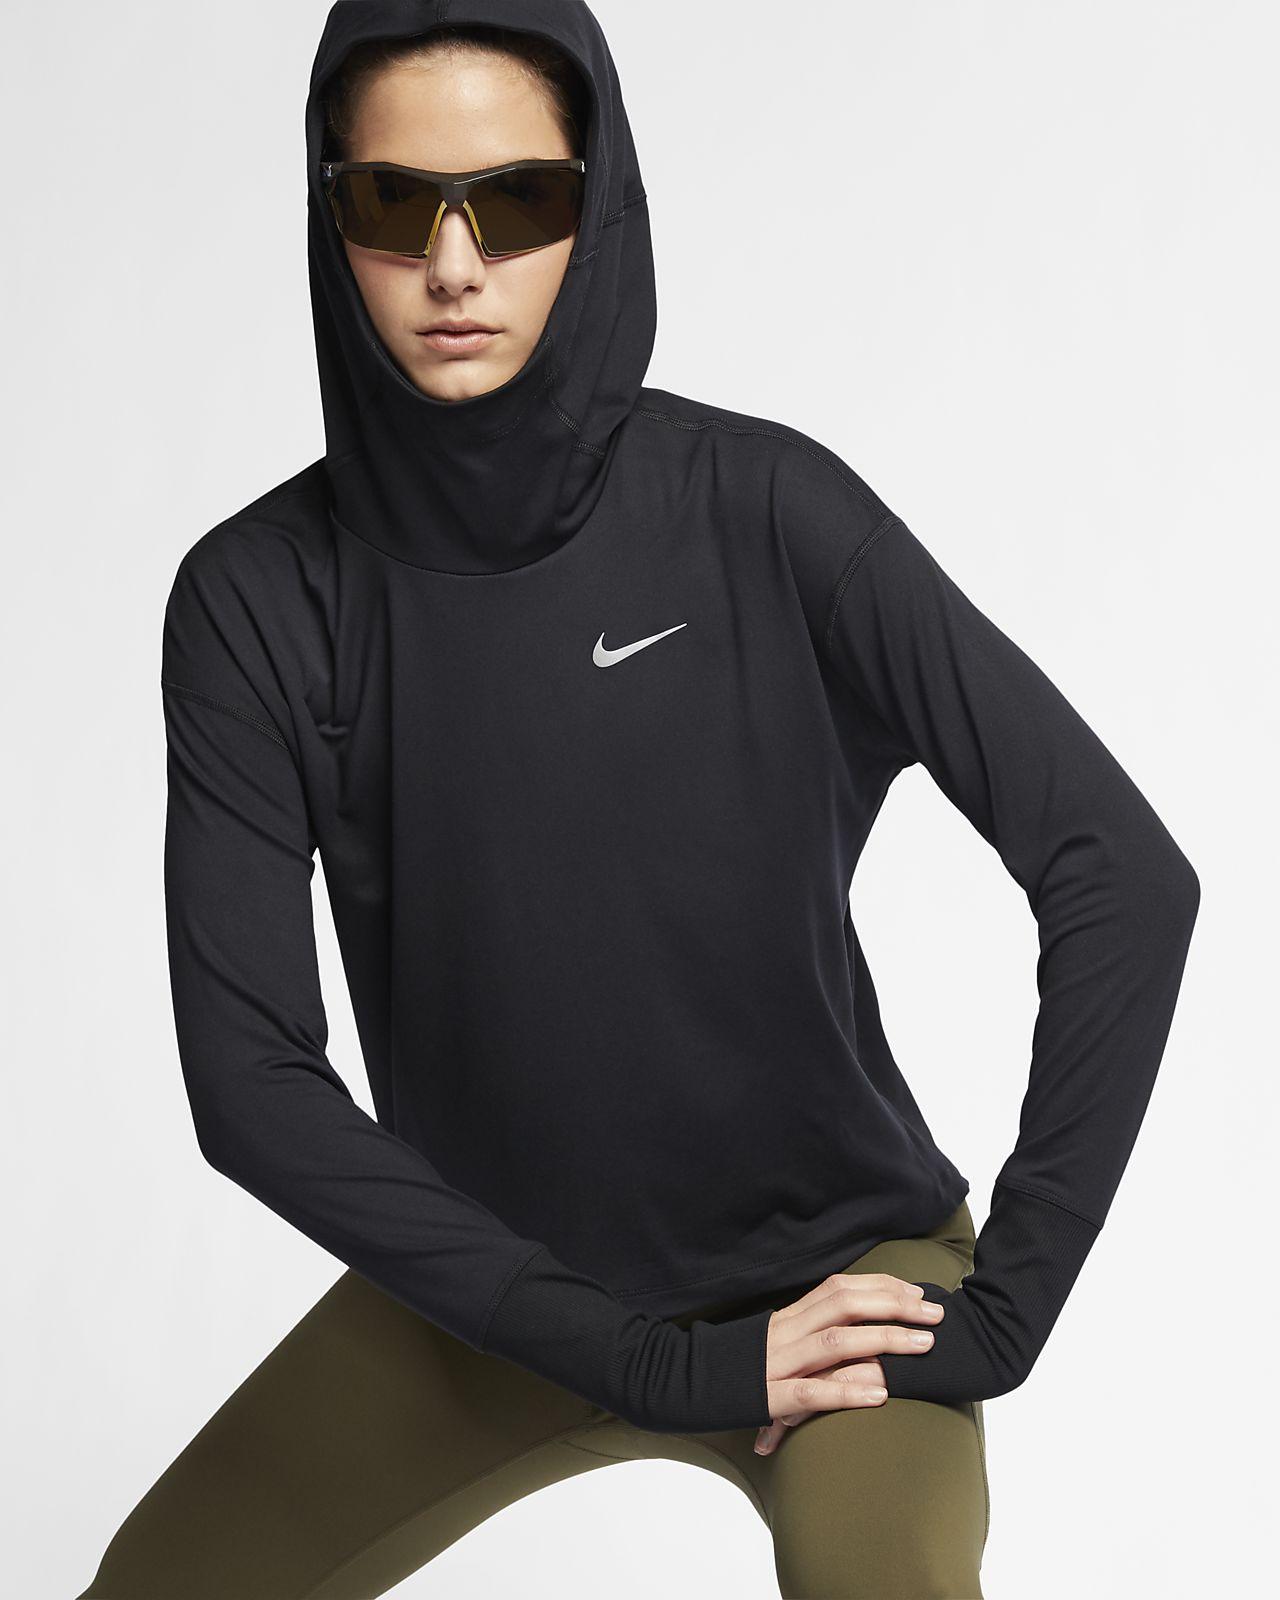 f064f487e338 Low Resolution Nike Element Women s Running Hoodie Nike Element Women s  Running Hoodie